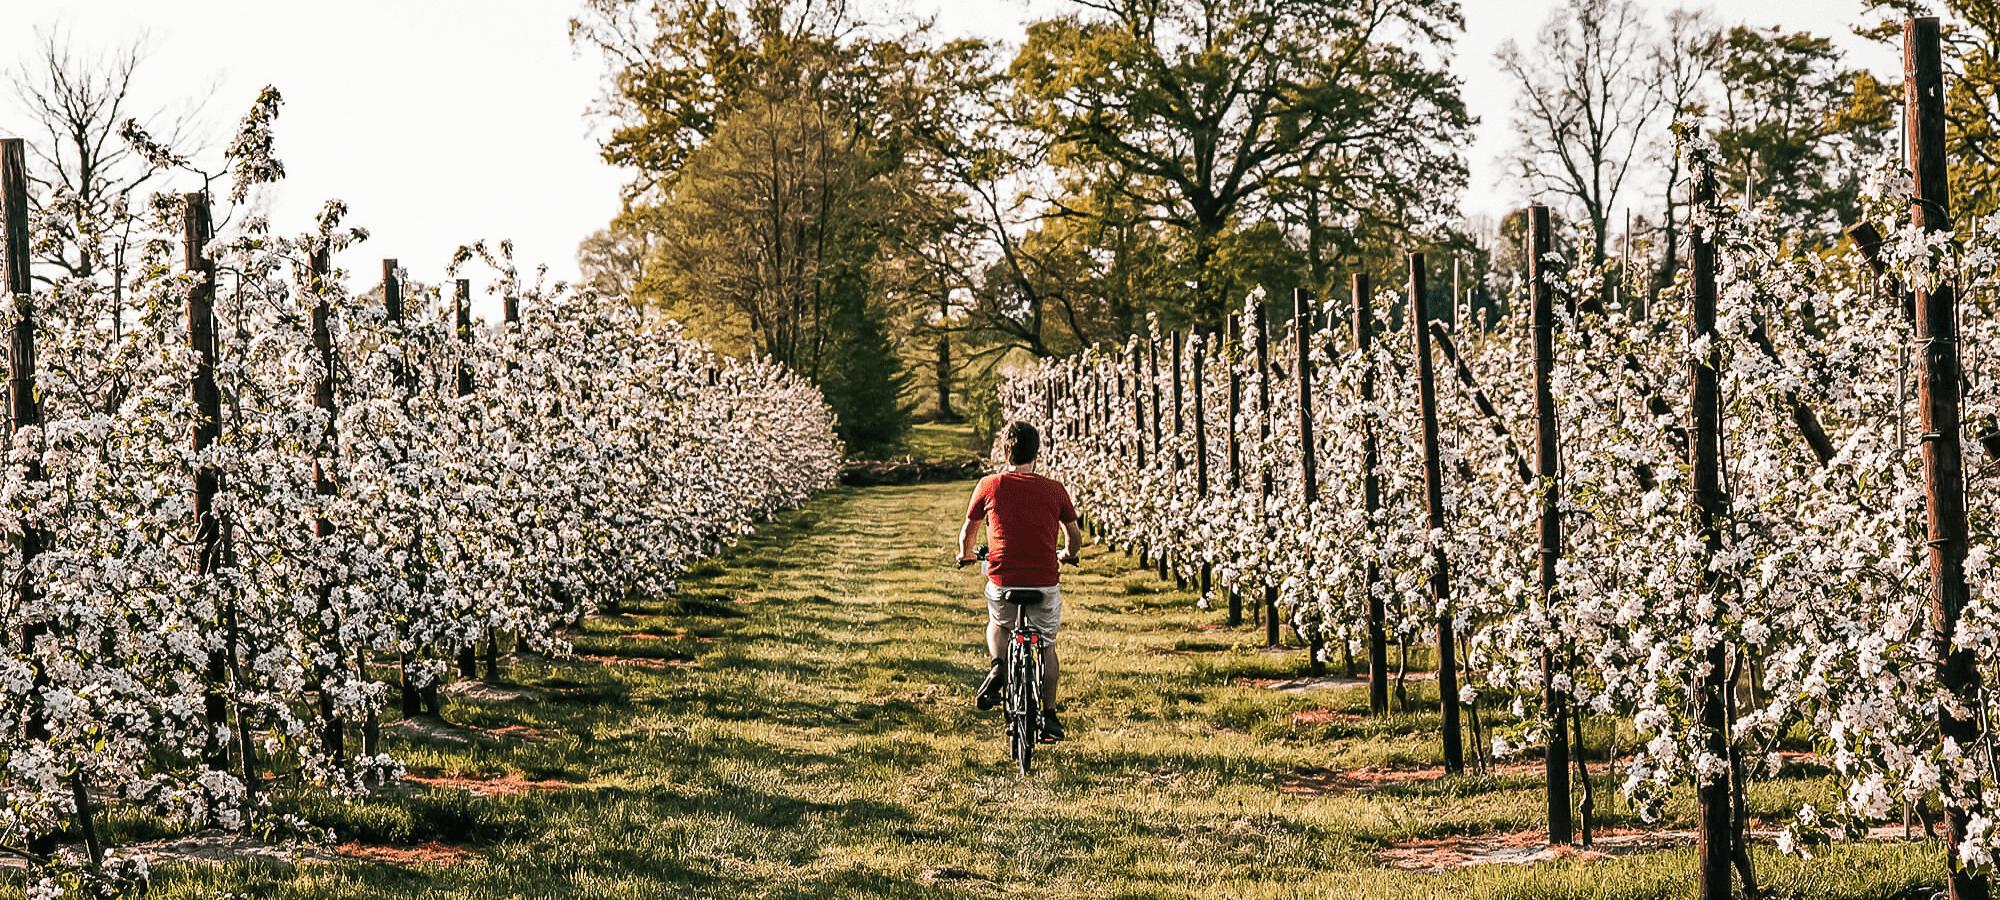 Man riding a bike on the Bloesemroute, Belgium